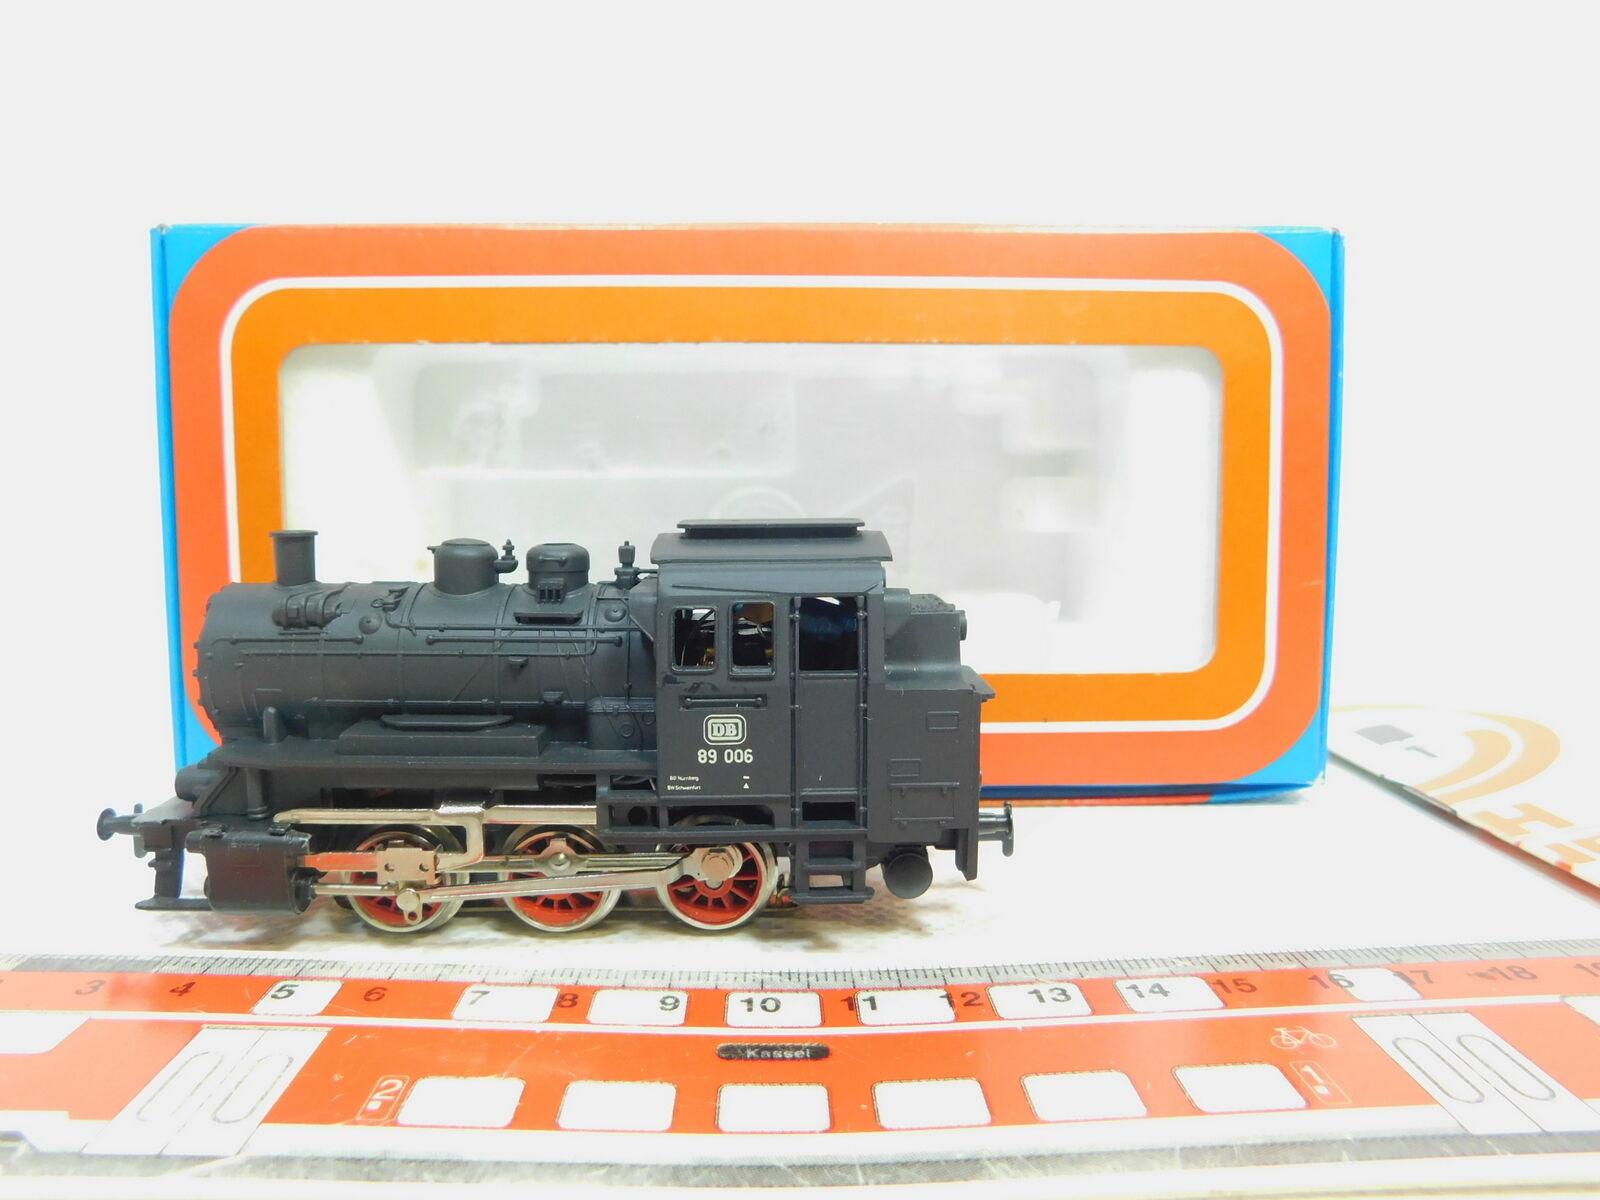 Bn267-0,5     H0/AC 3000 LOCOMOTIVA TENDER/Locomotiva a vapore 89 006